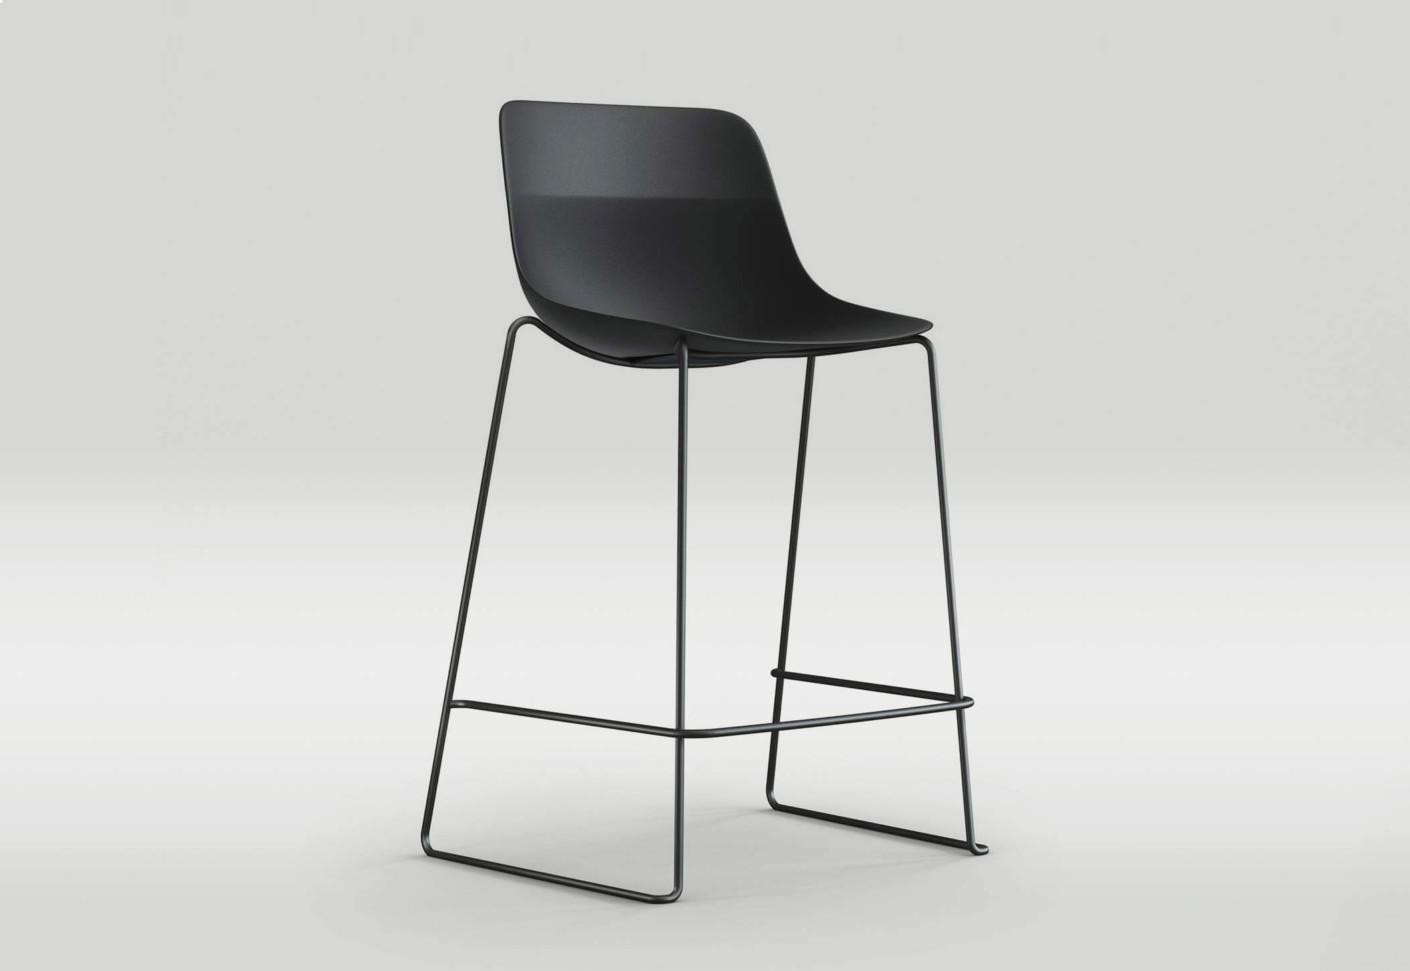 kitchen swivel chairs cabinets modern crona light bar 6308 by brunner | stylepark